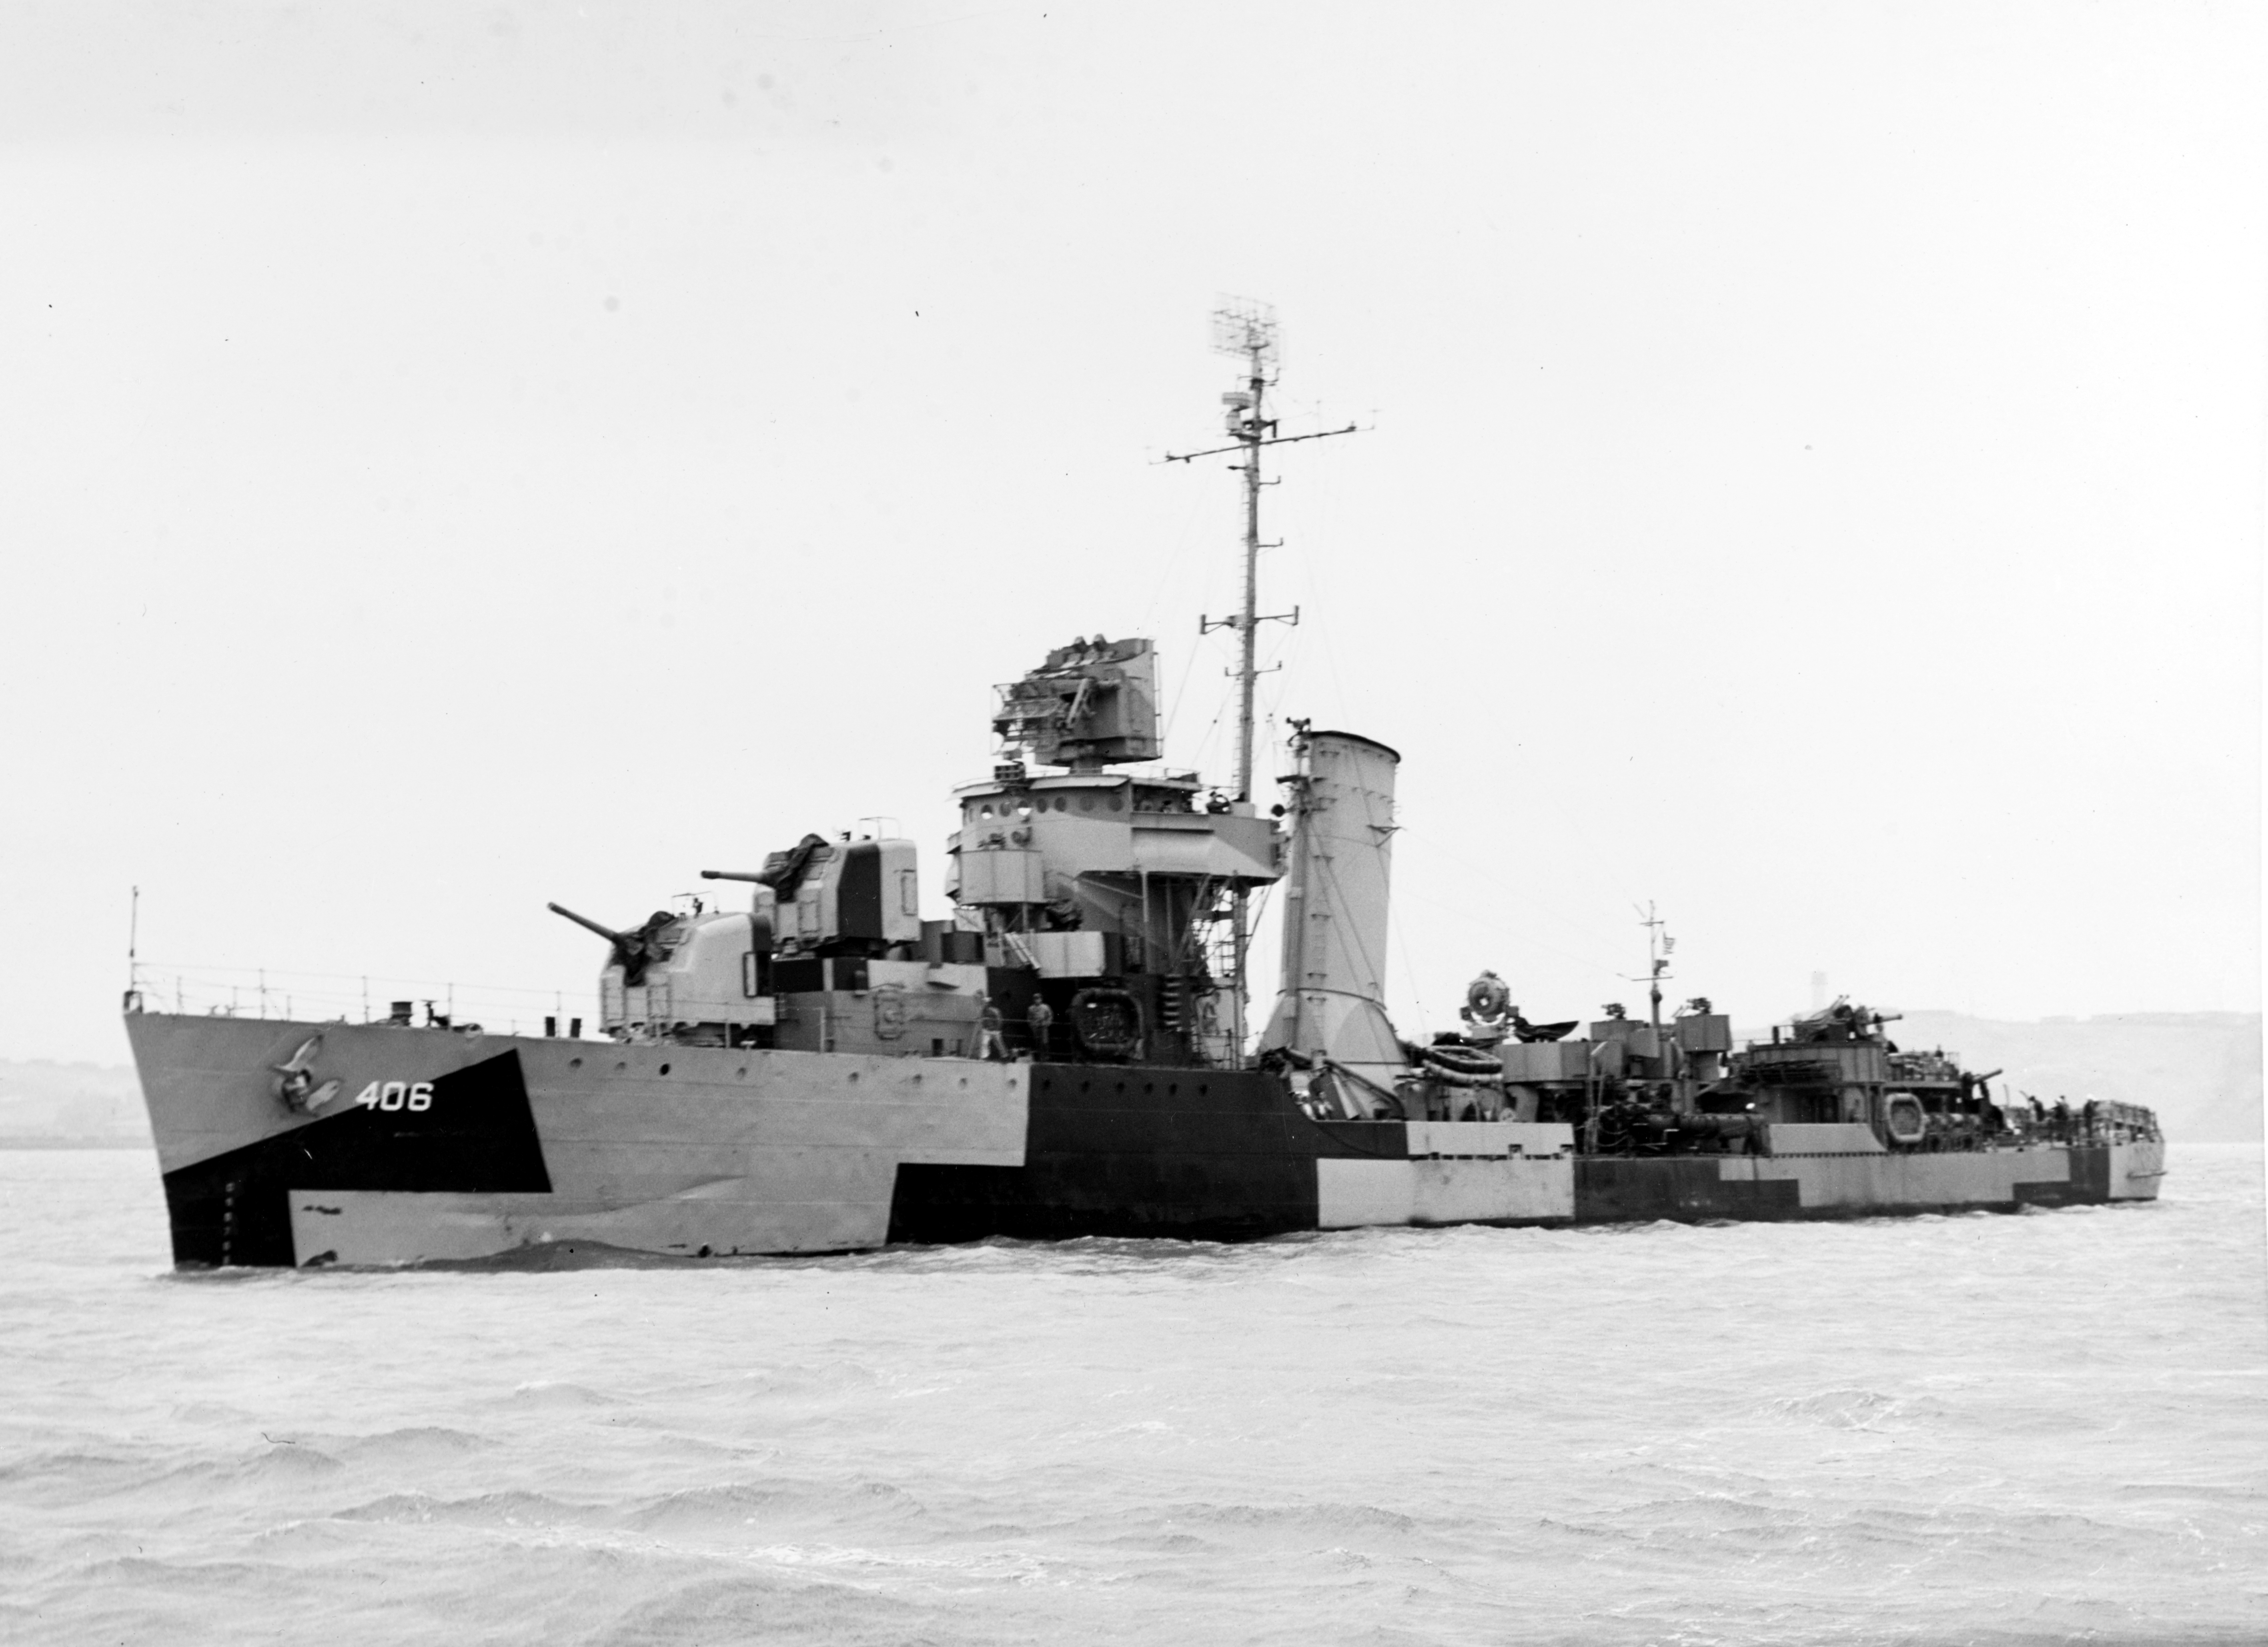 http://upload.wikimedia.org/wikipedia/commons/b/bc/USS_Stack_%28DD-406%29.jpg